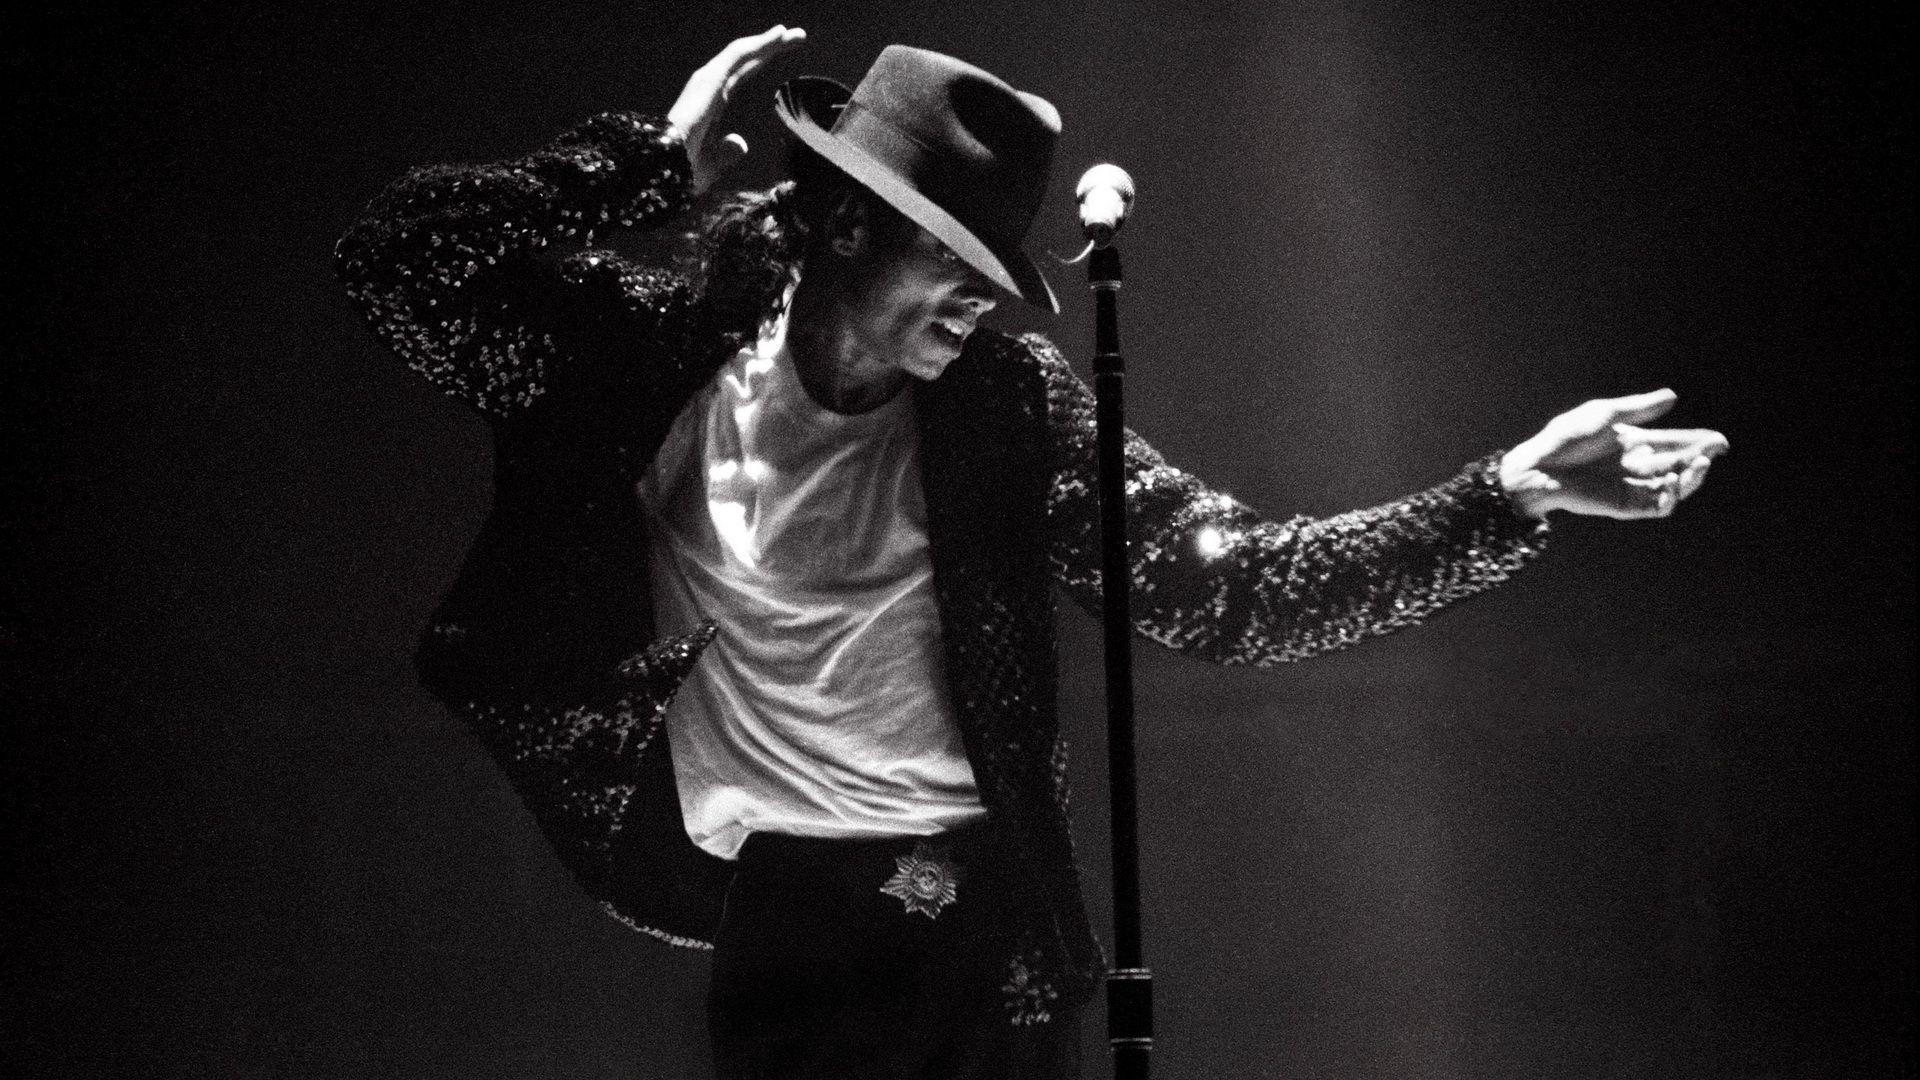 Michael Jackson Wallpaper Desktop Background ♡ O L D ♡ T